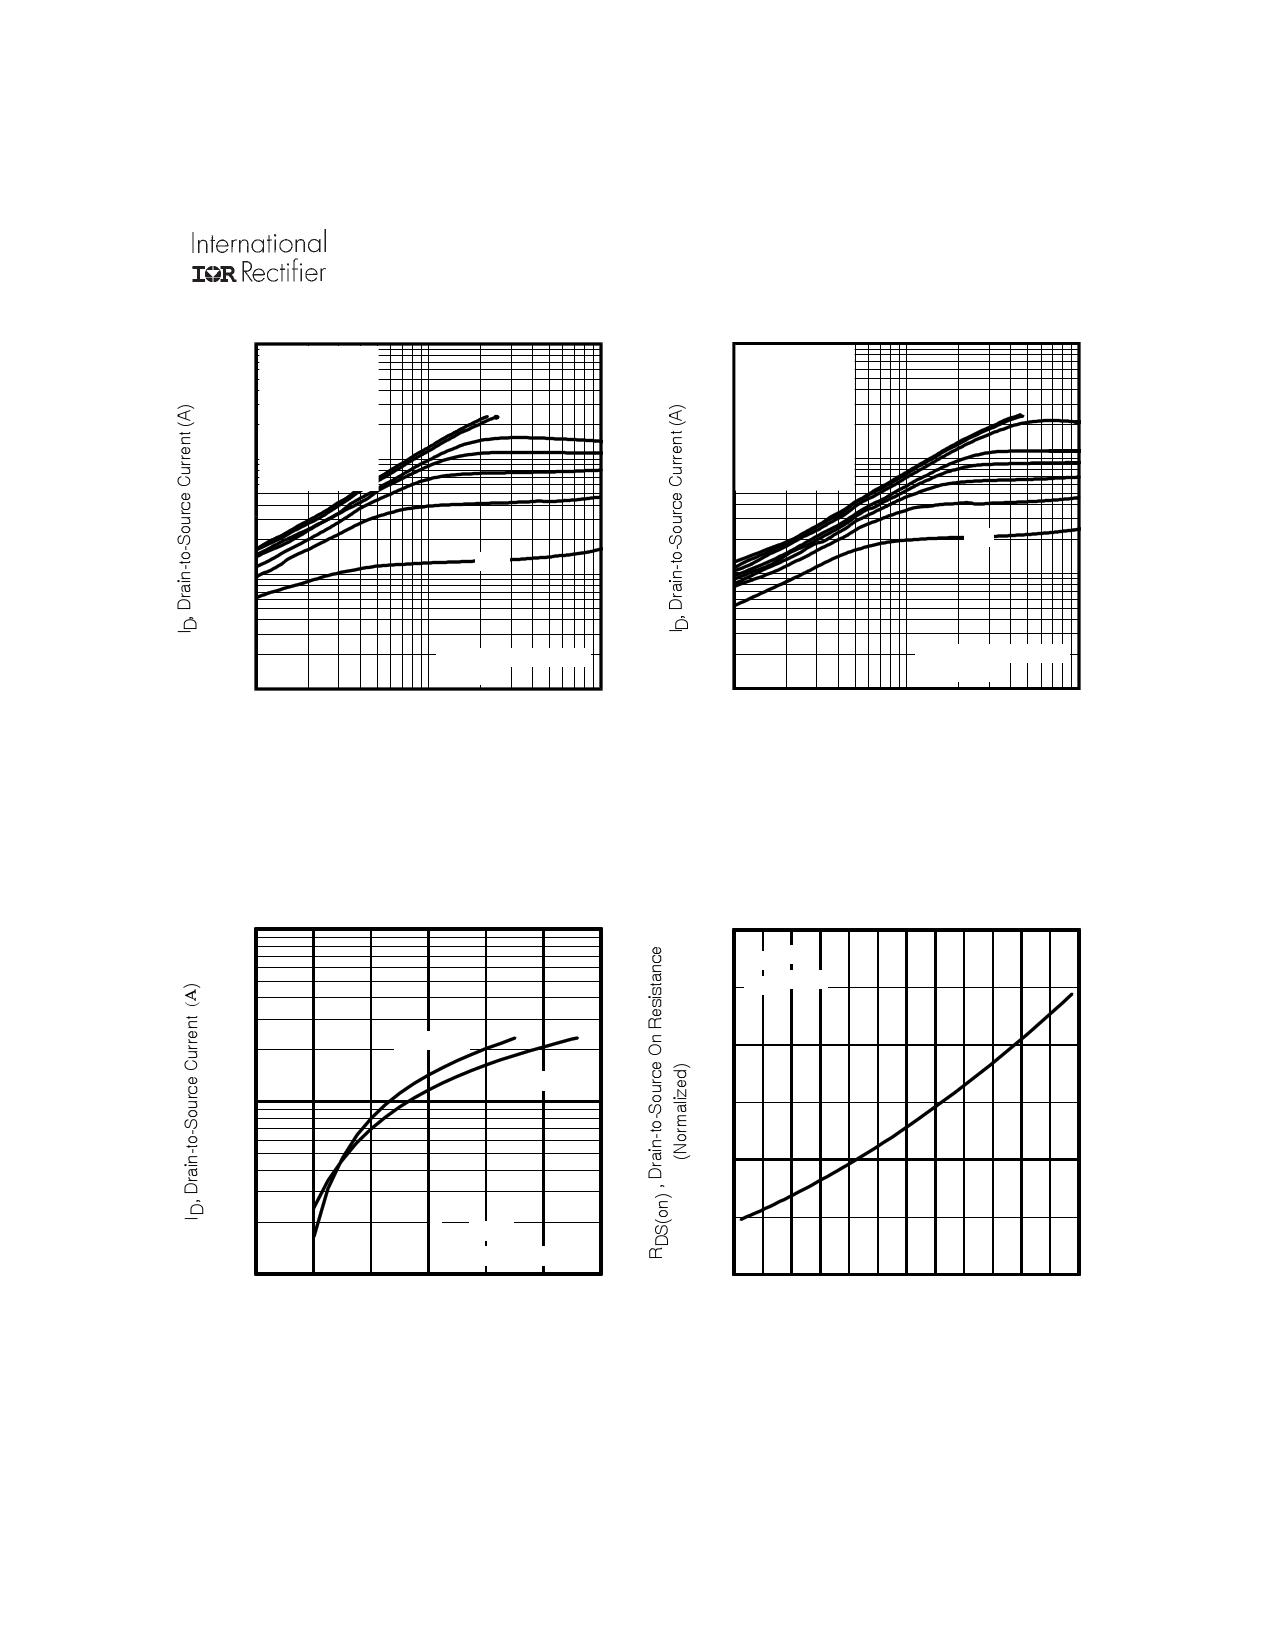 IRF3707ZCSPbF pdf, ピン配列